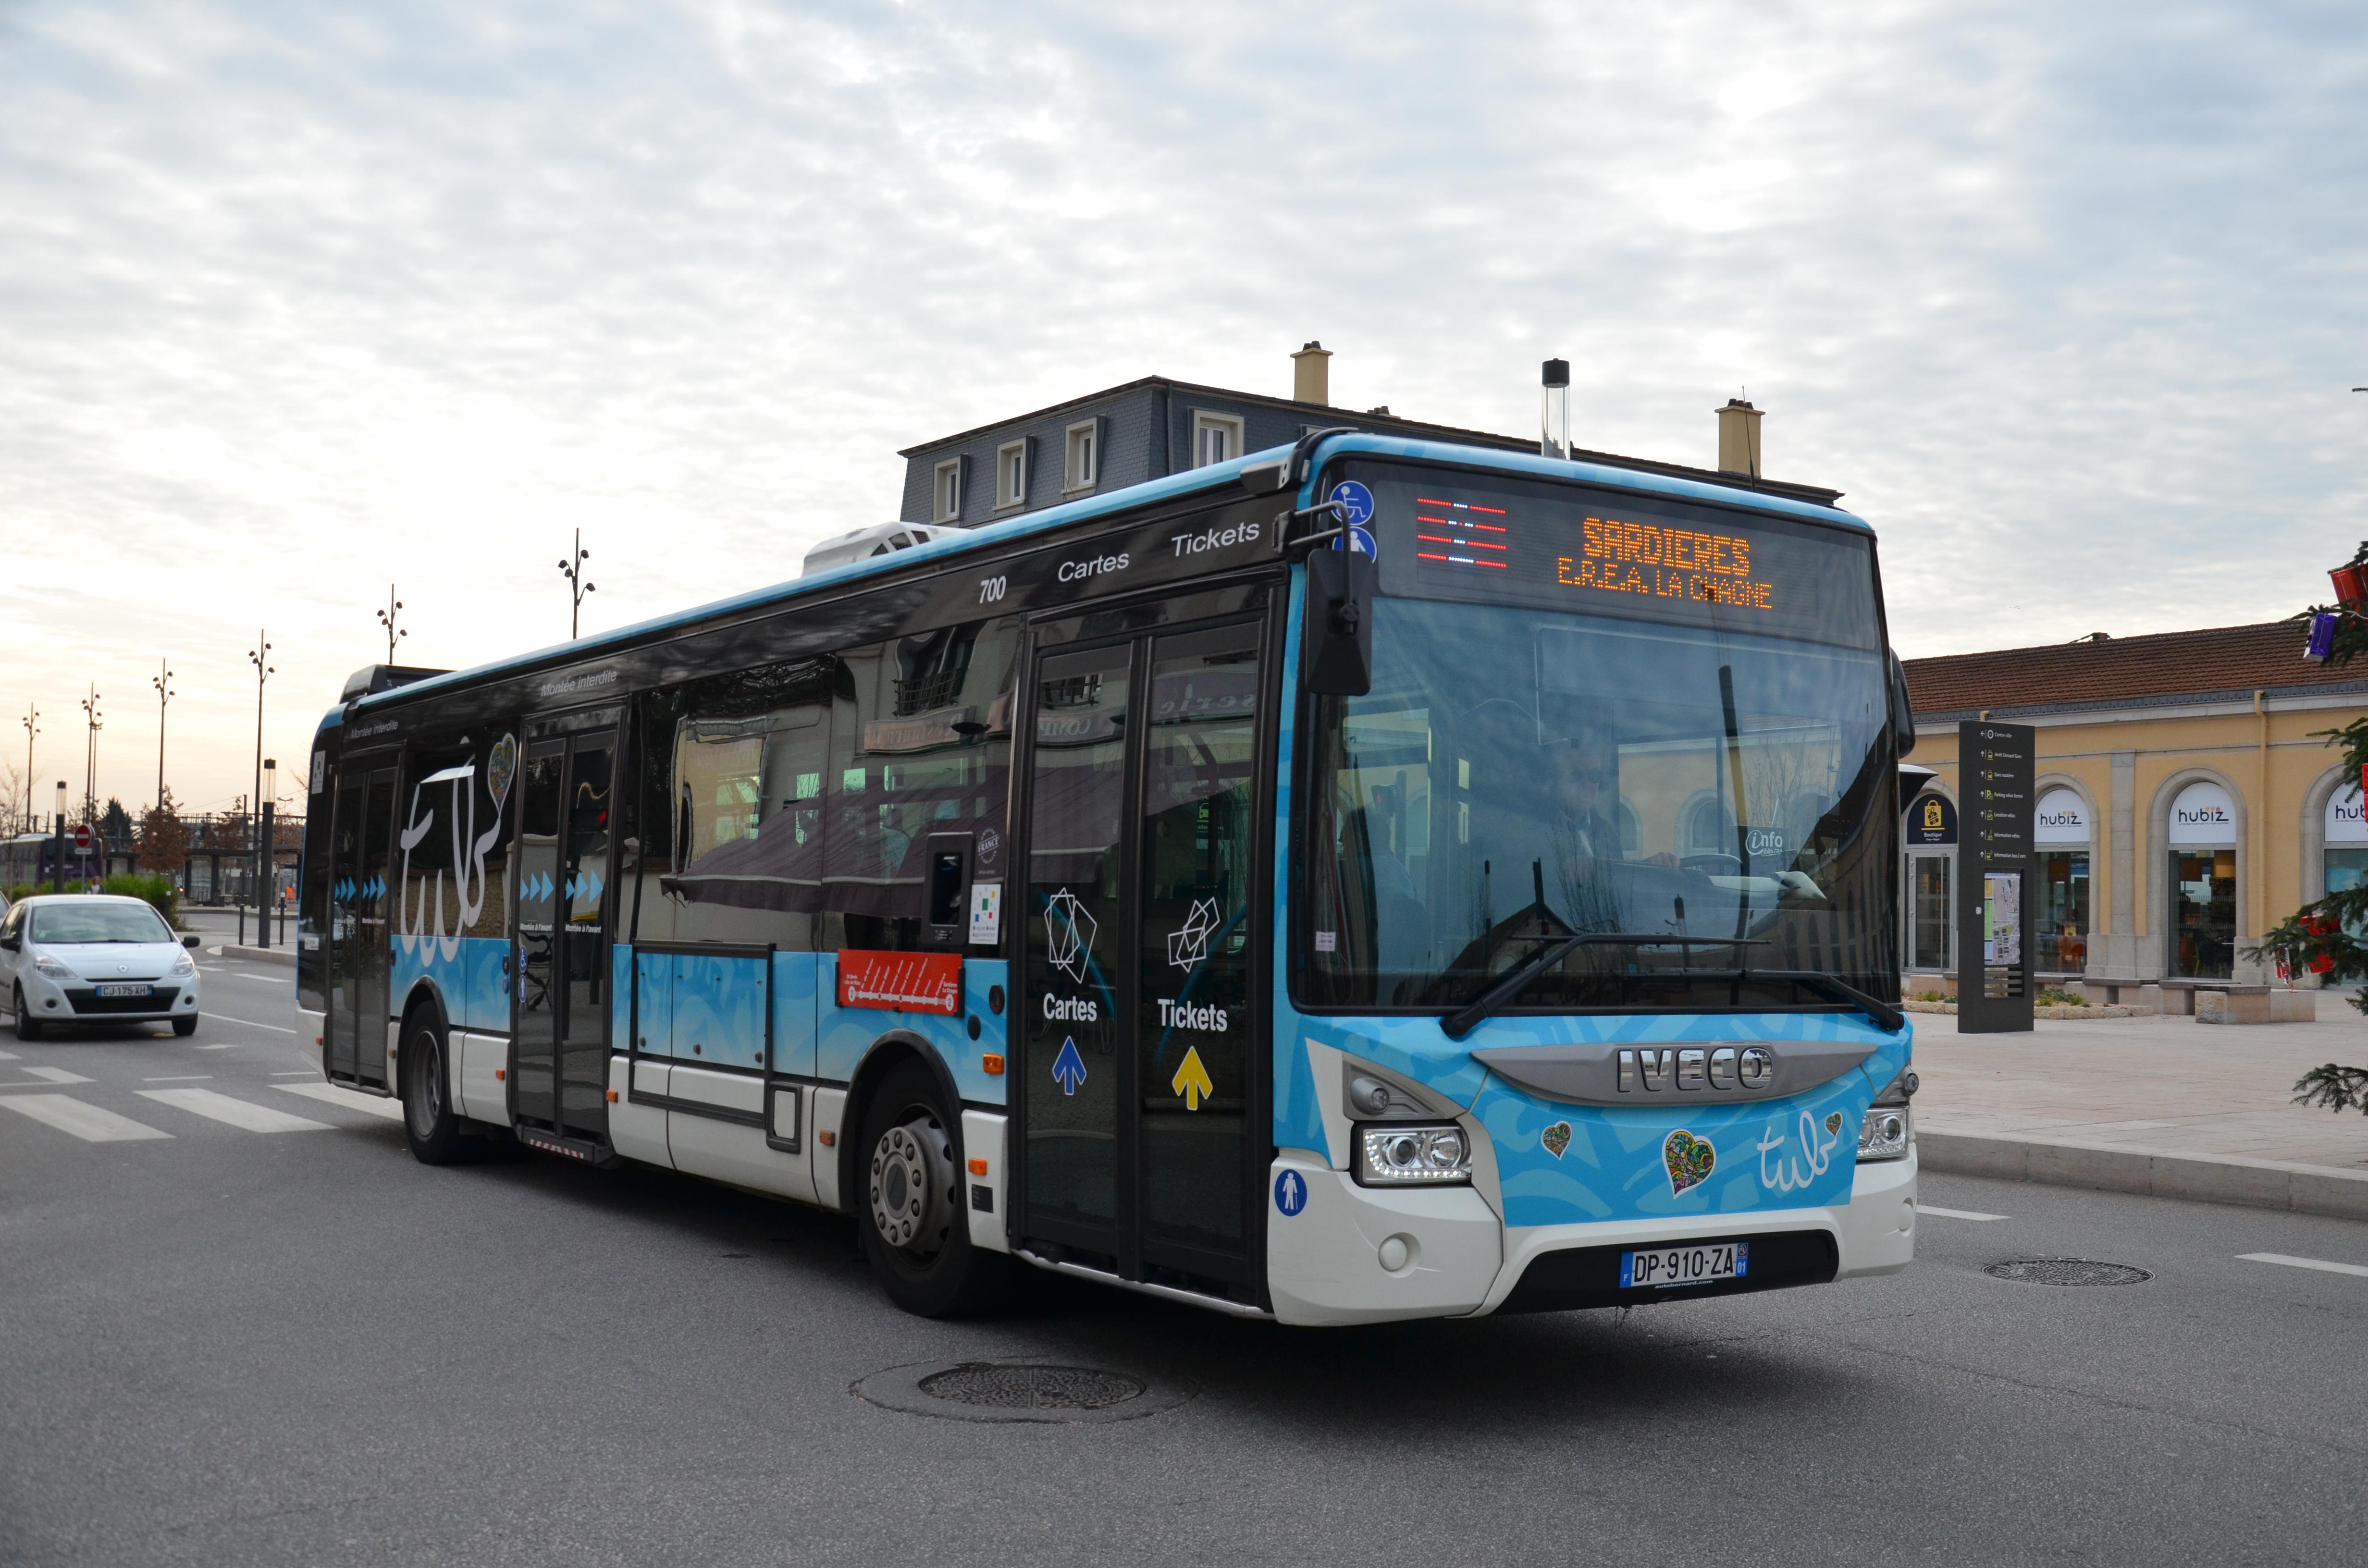 File:Iveco Bus Urbanway 12 n°700 TUB Sémard Gare.jpg - Wikimedia Commons